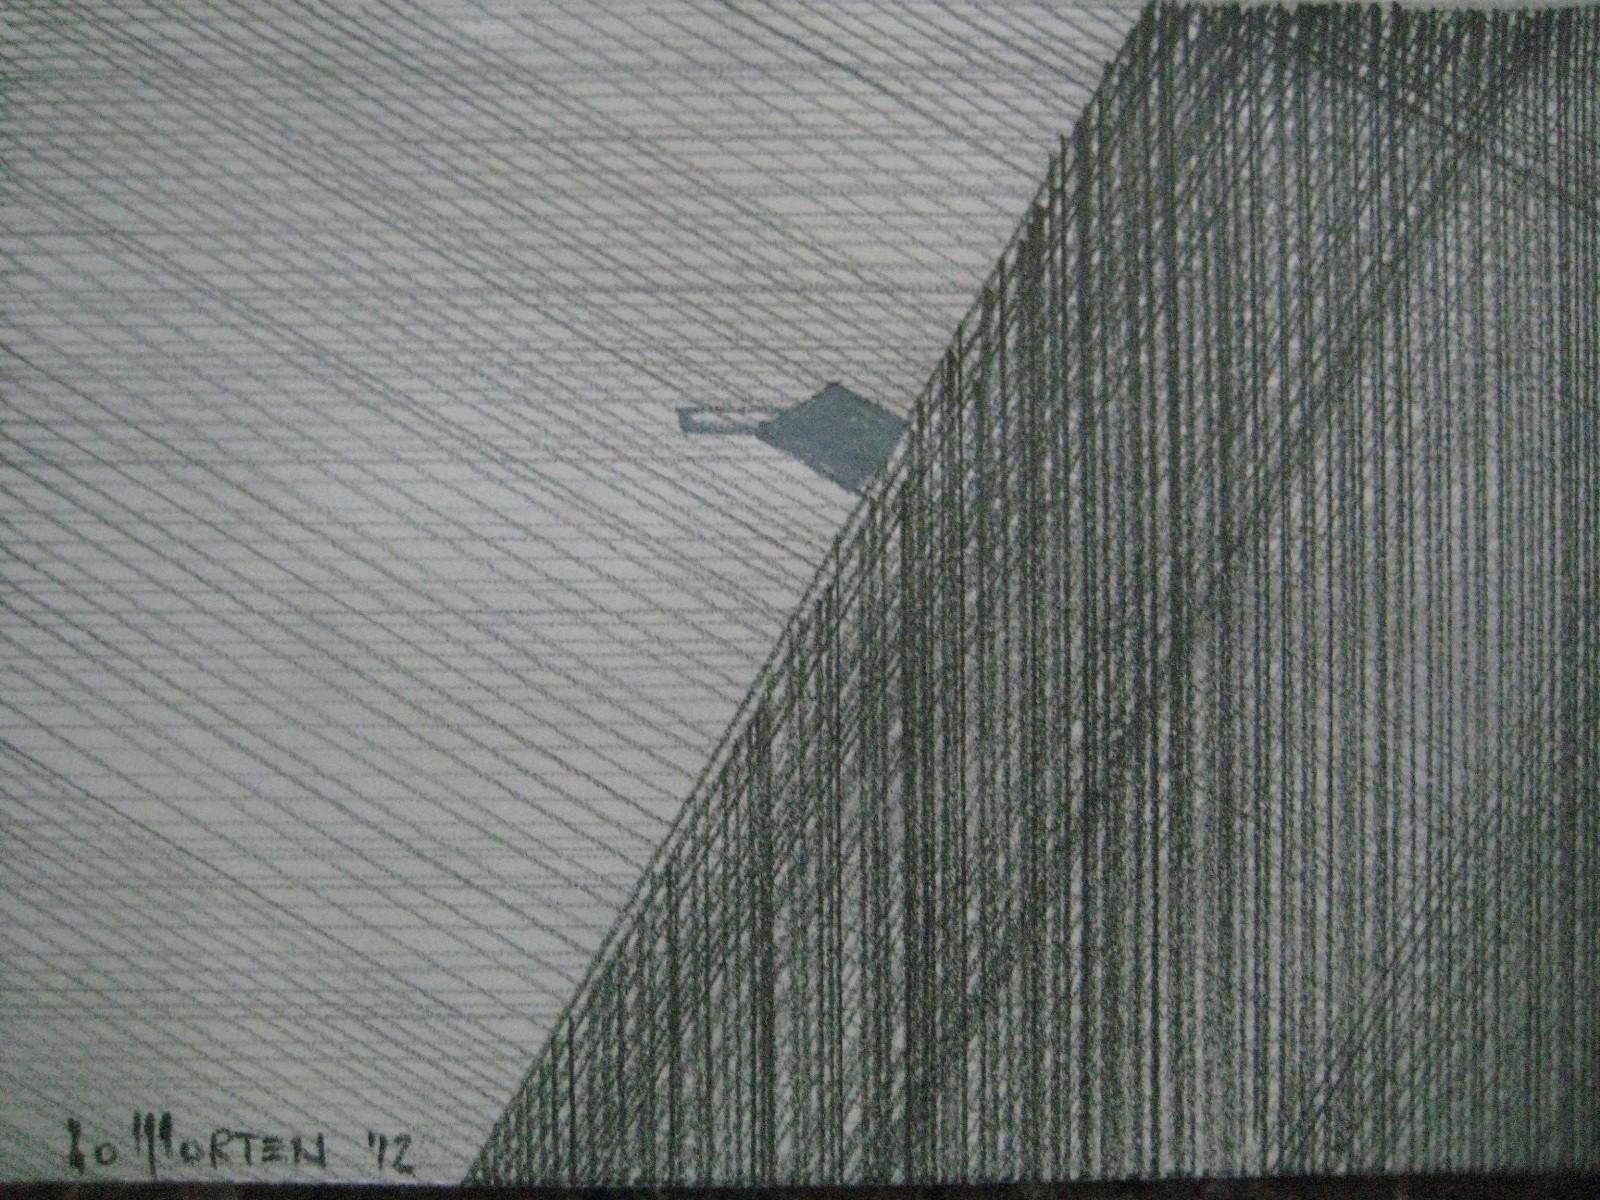 HAUS AM HANG, 2011, Johannes Morten, 10,5 x 14,8 cm, Aquarell und Graphit auf Papier